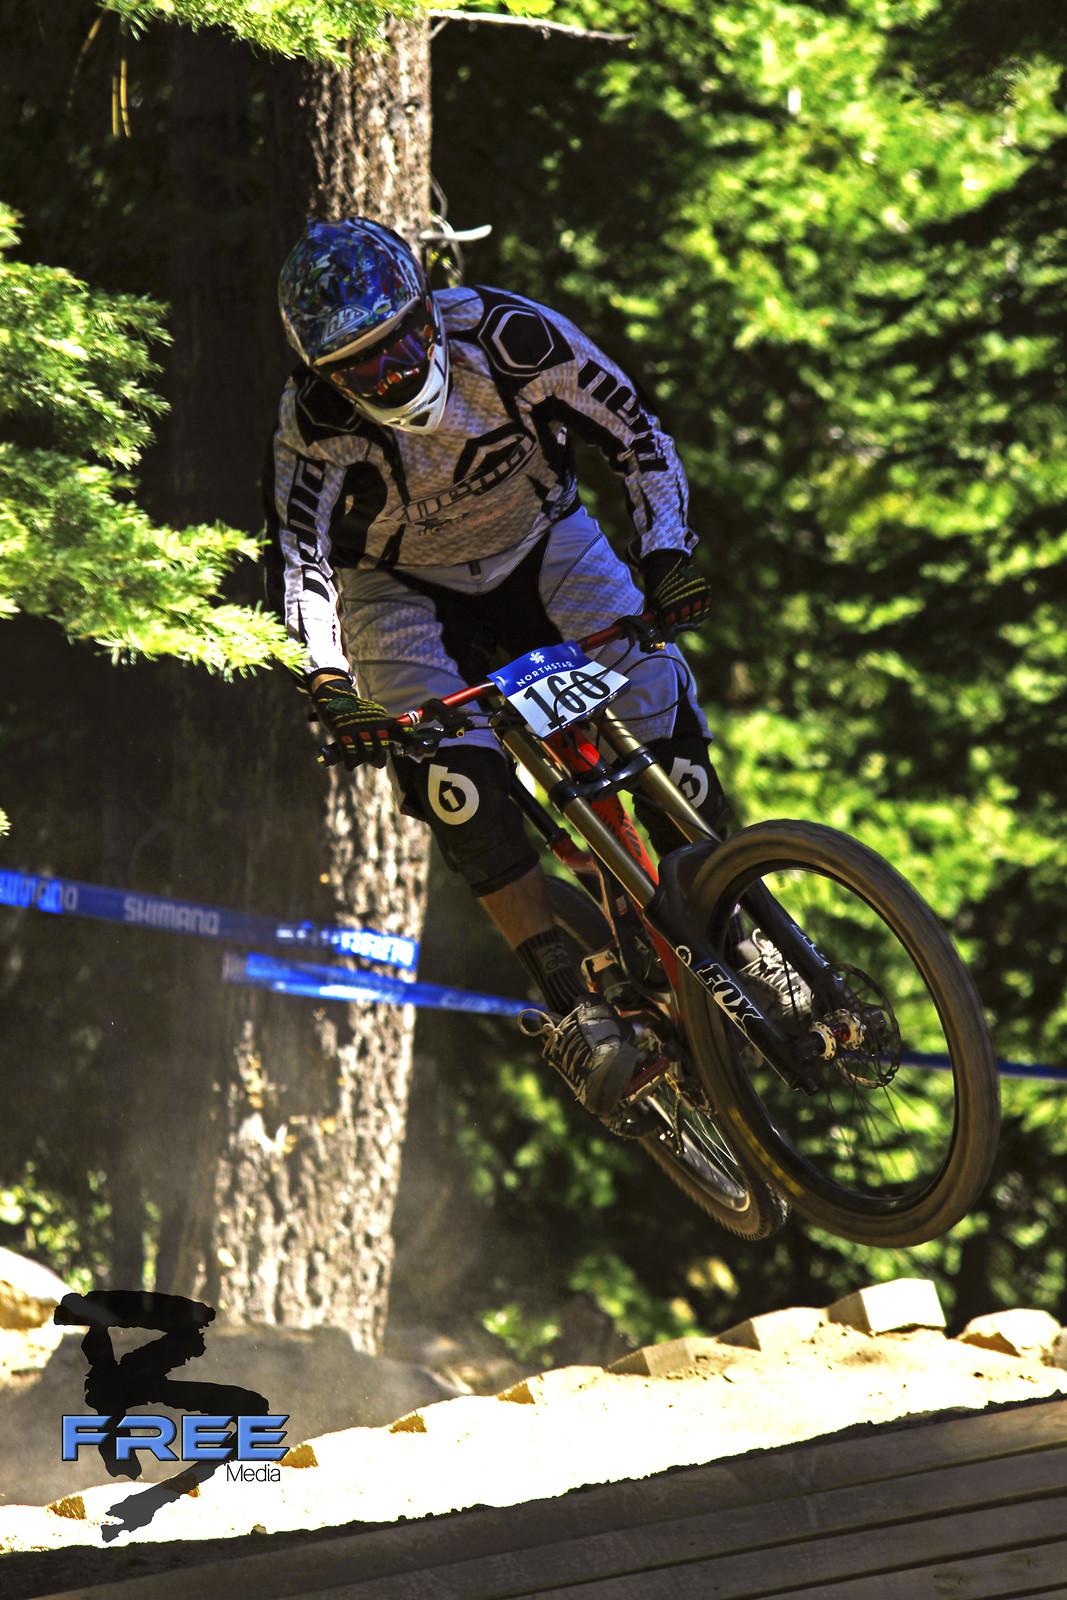 done1 - GnarHuck - Mountain Biking Pictures - Vital MTB